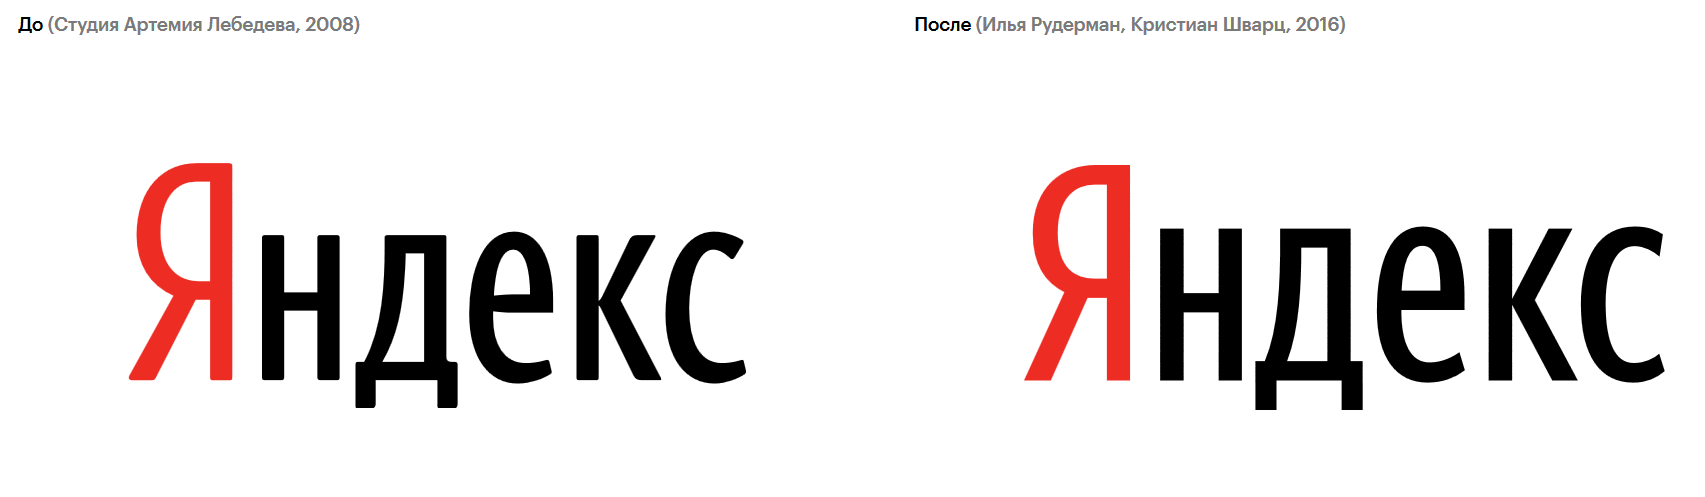 Почувствуйте разницу: Яндекс обновил свой логотип